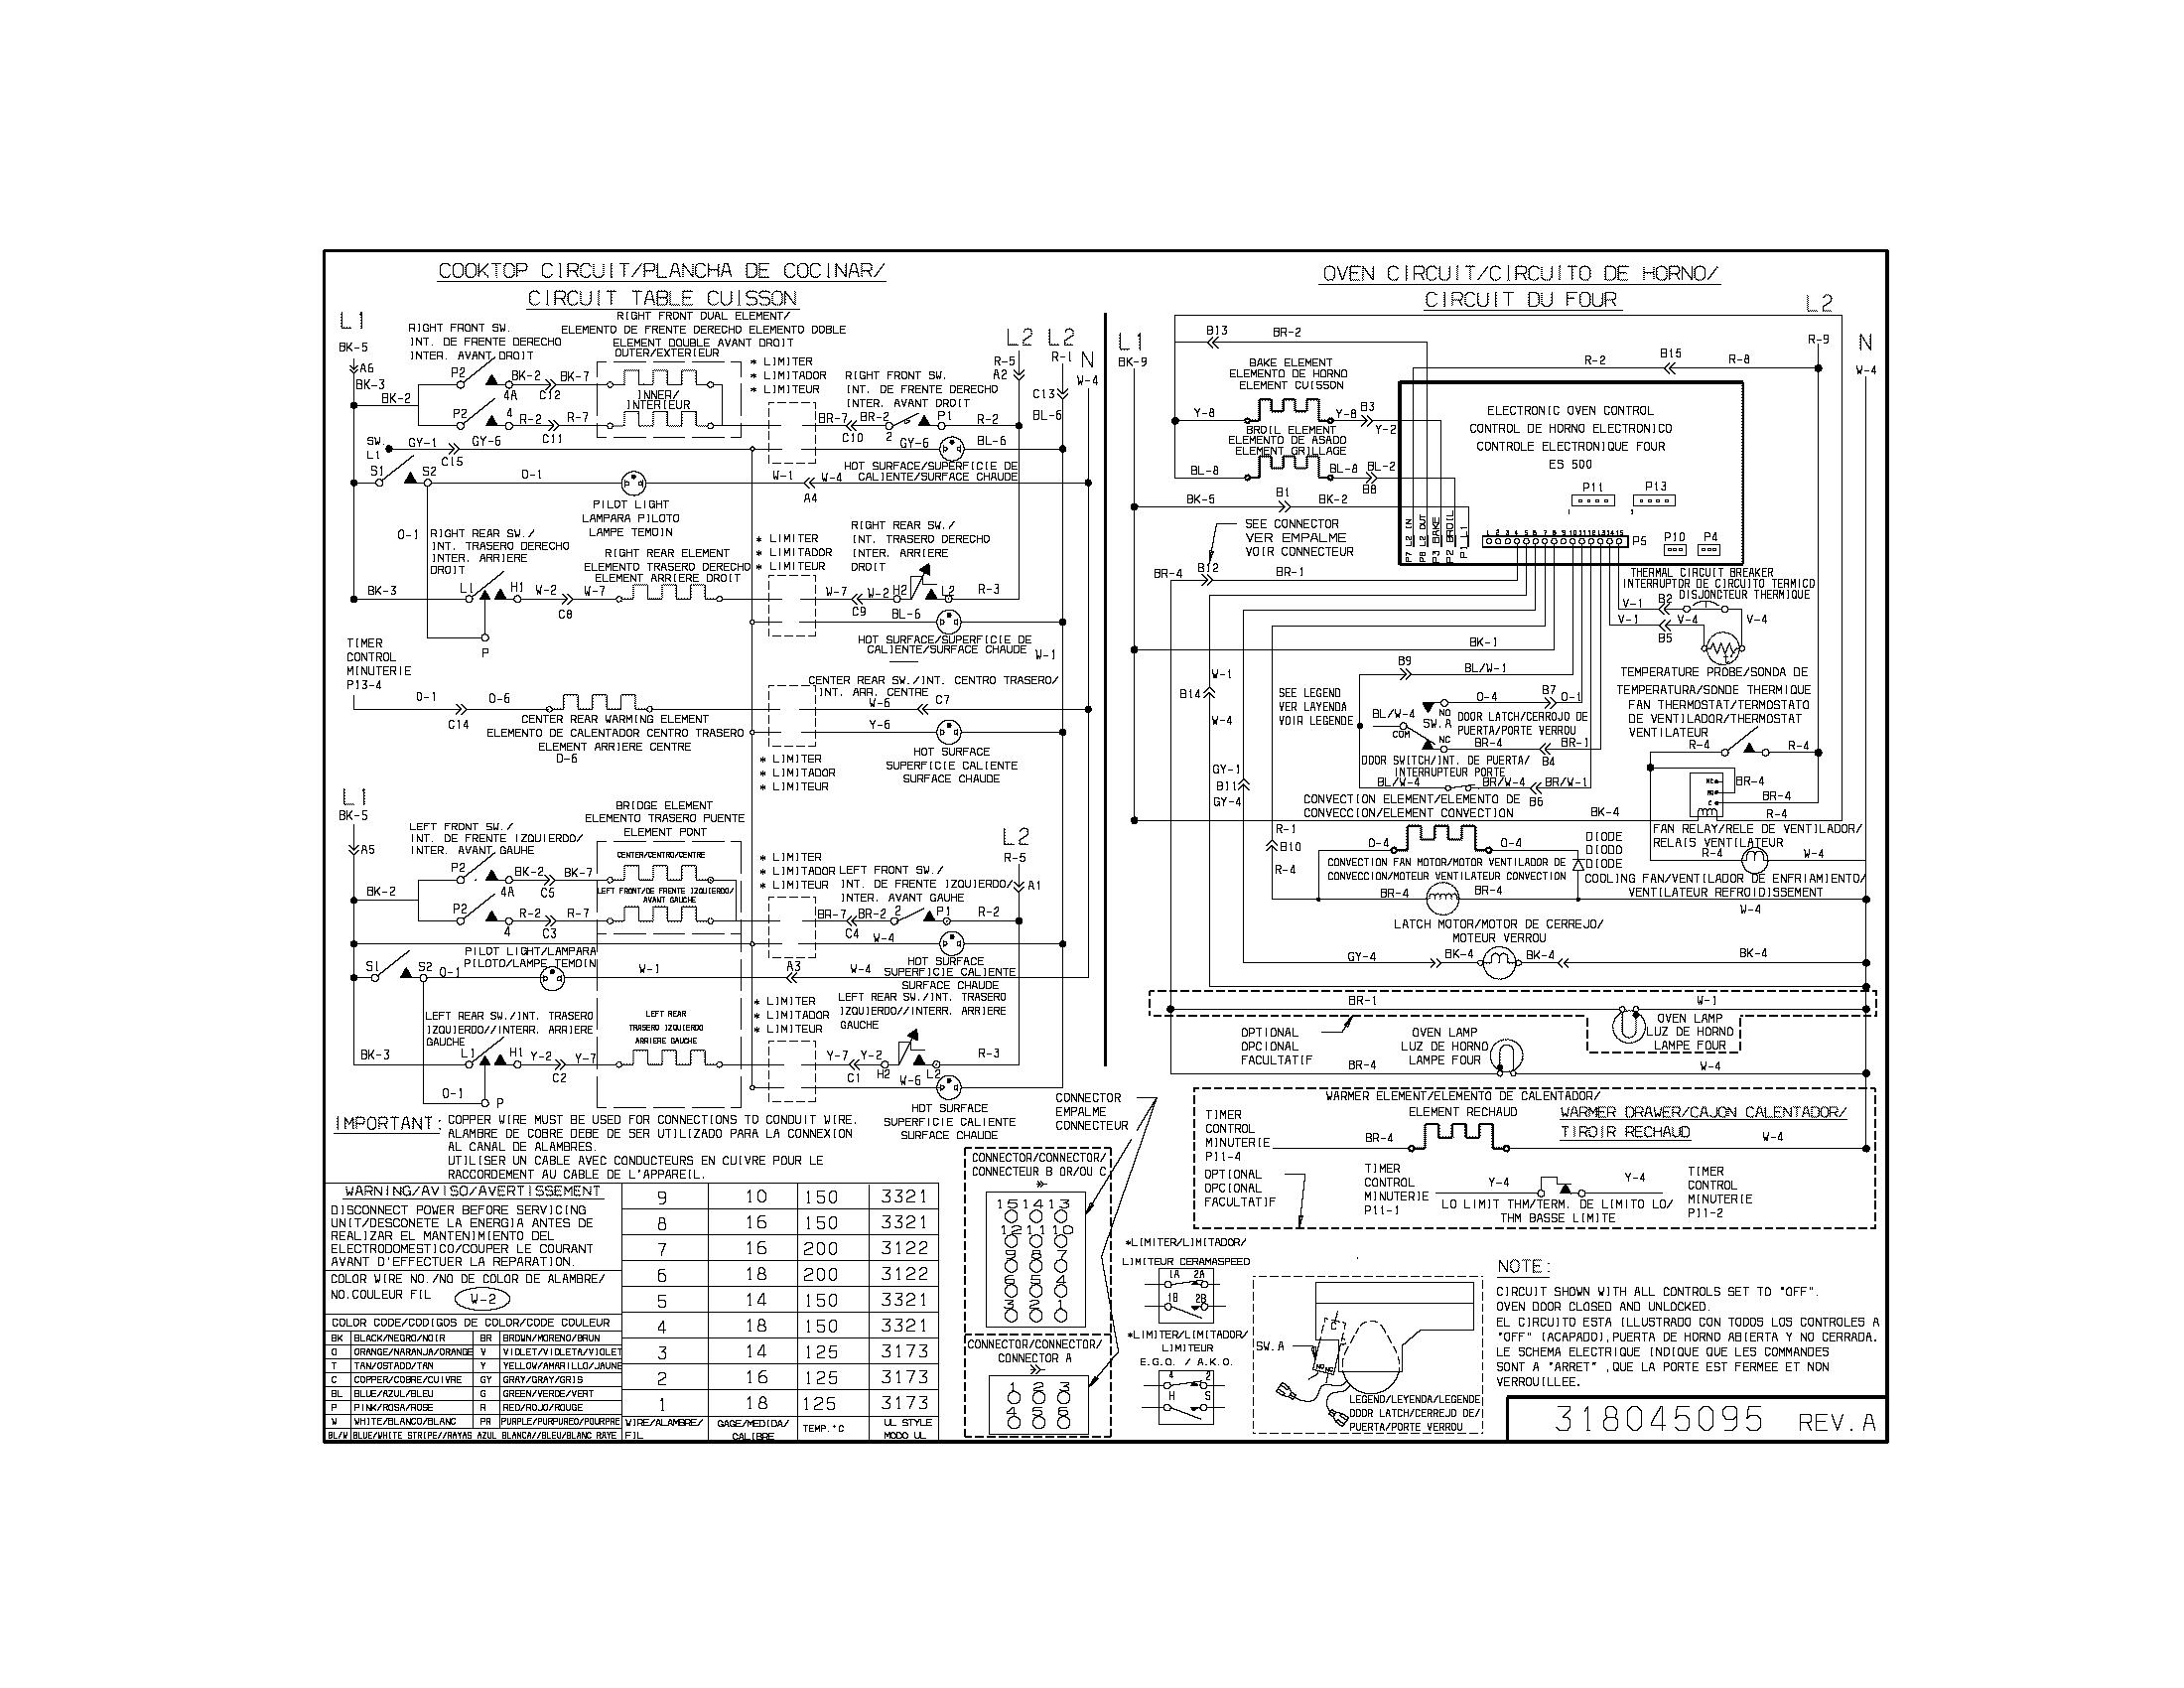 Ge Microwave Diagrams Free Wiring Diagram For You Webster Burner Jbx 33 Oven Schematics Parts List